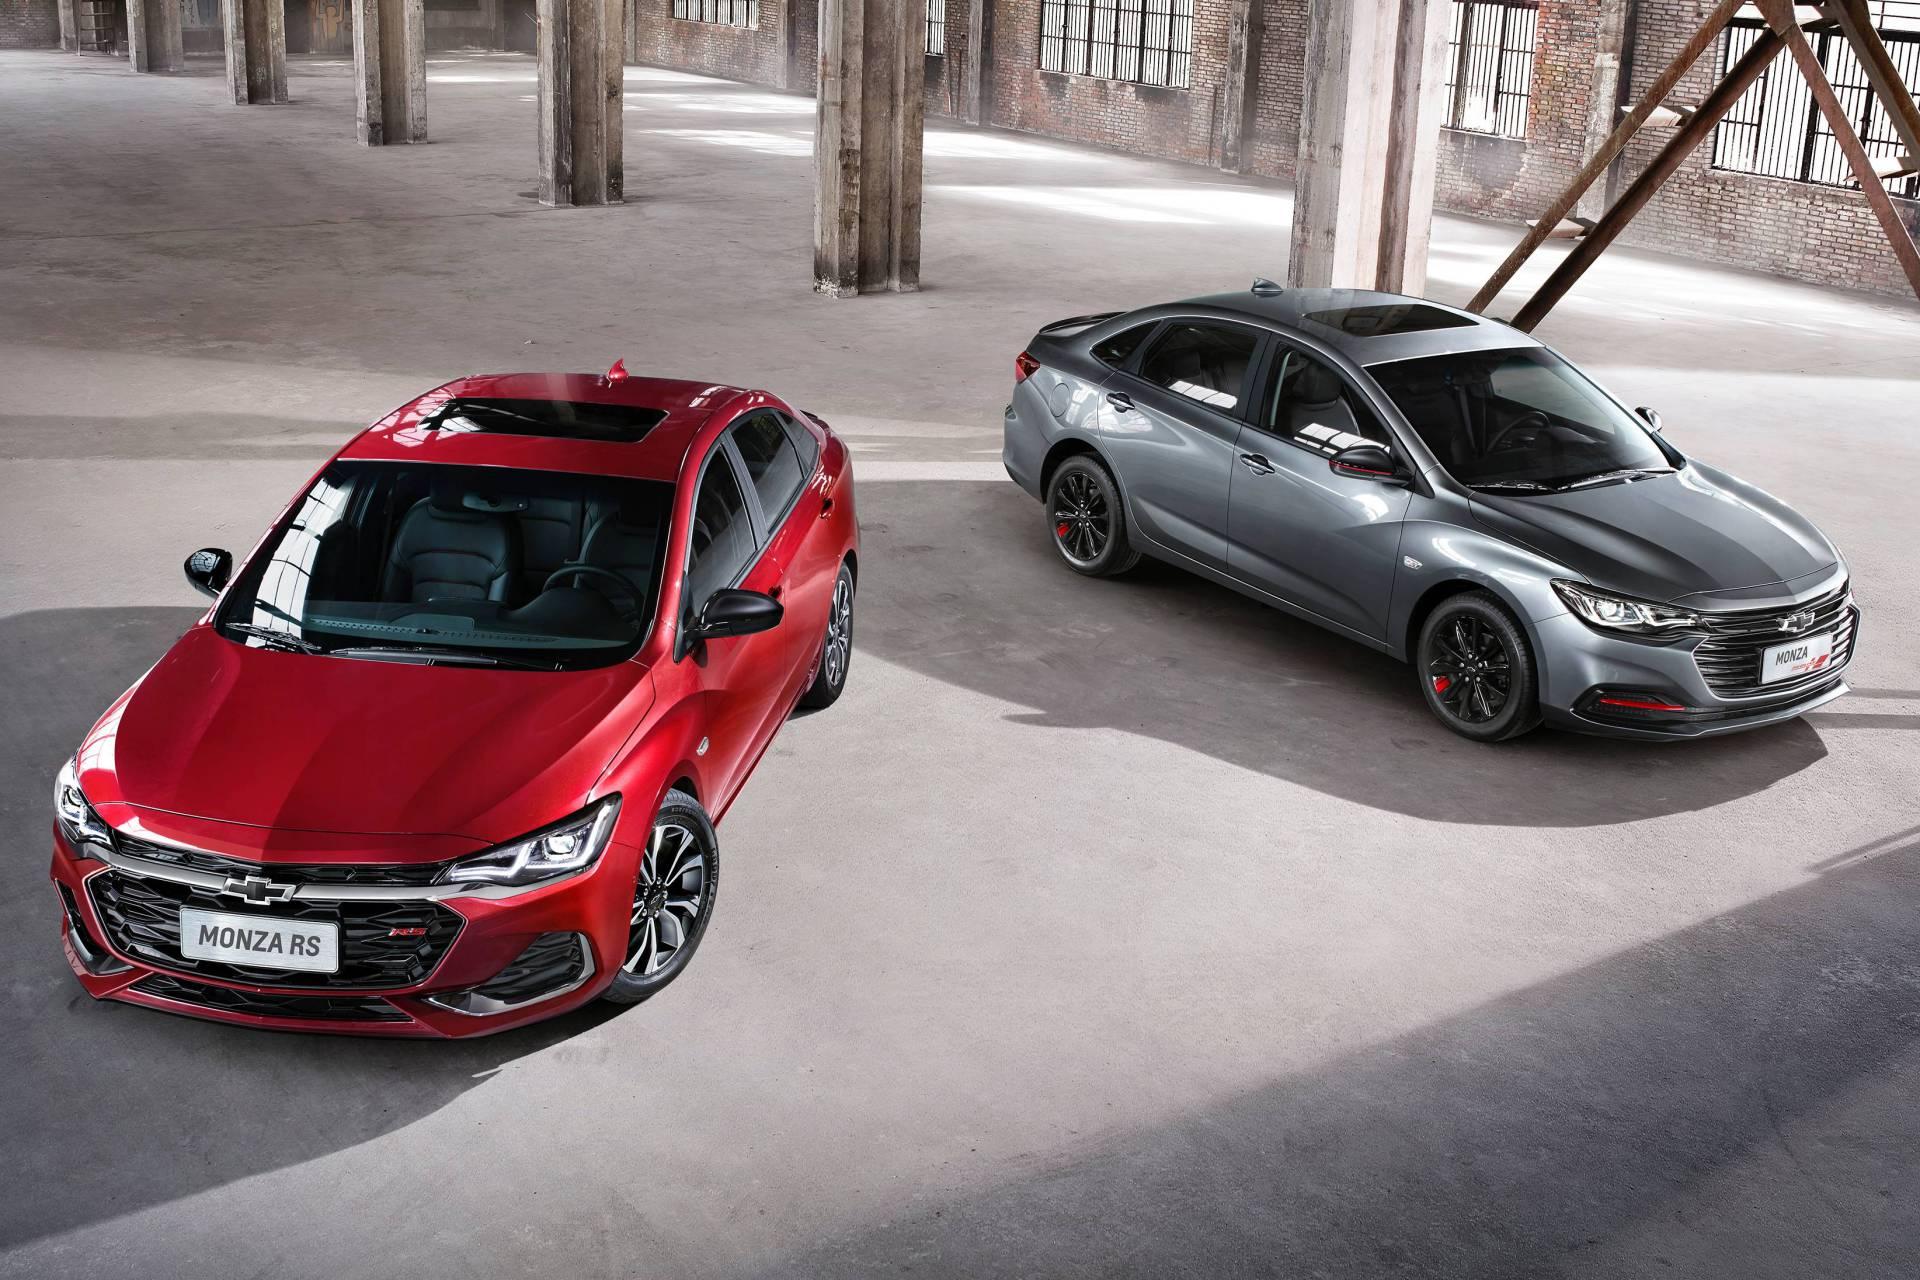 2019 Chevrolet Onix Sedan Revealed In China Before Global ...